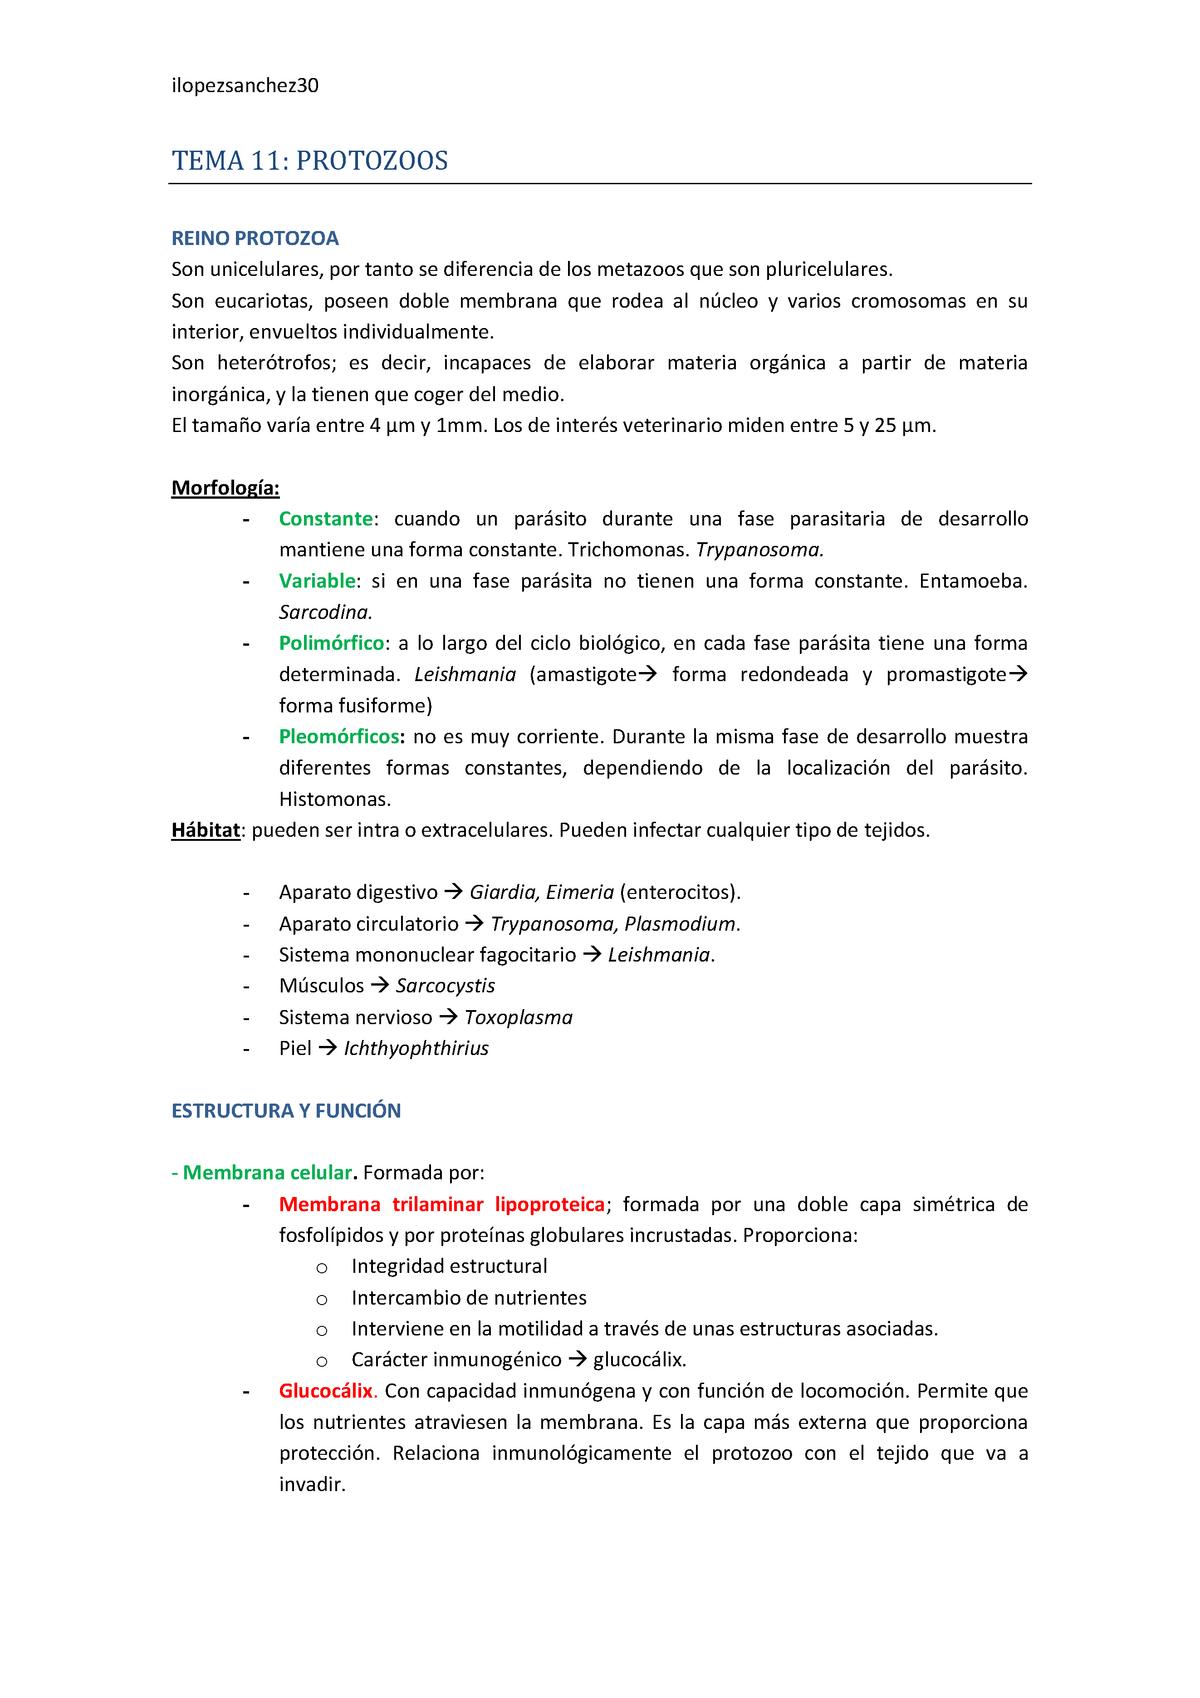 Tema 11 Parasitología Veterinaria Ucm Studocu